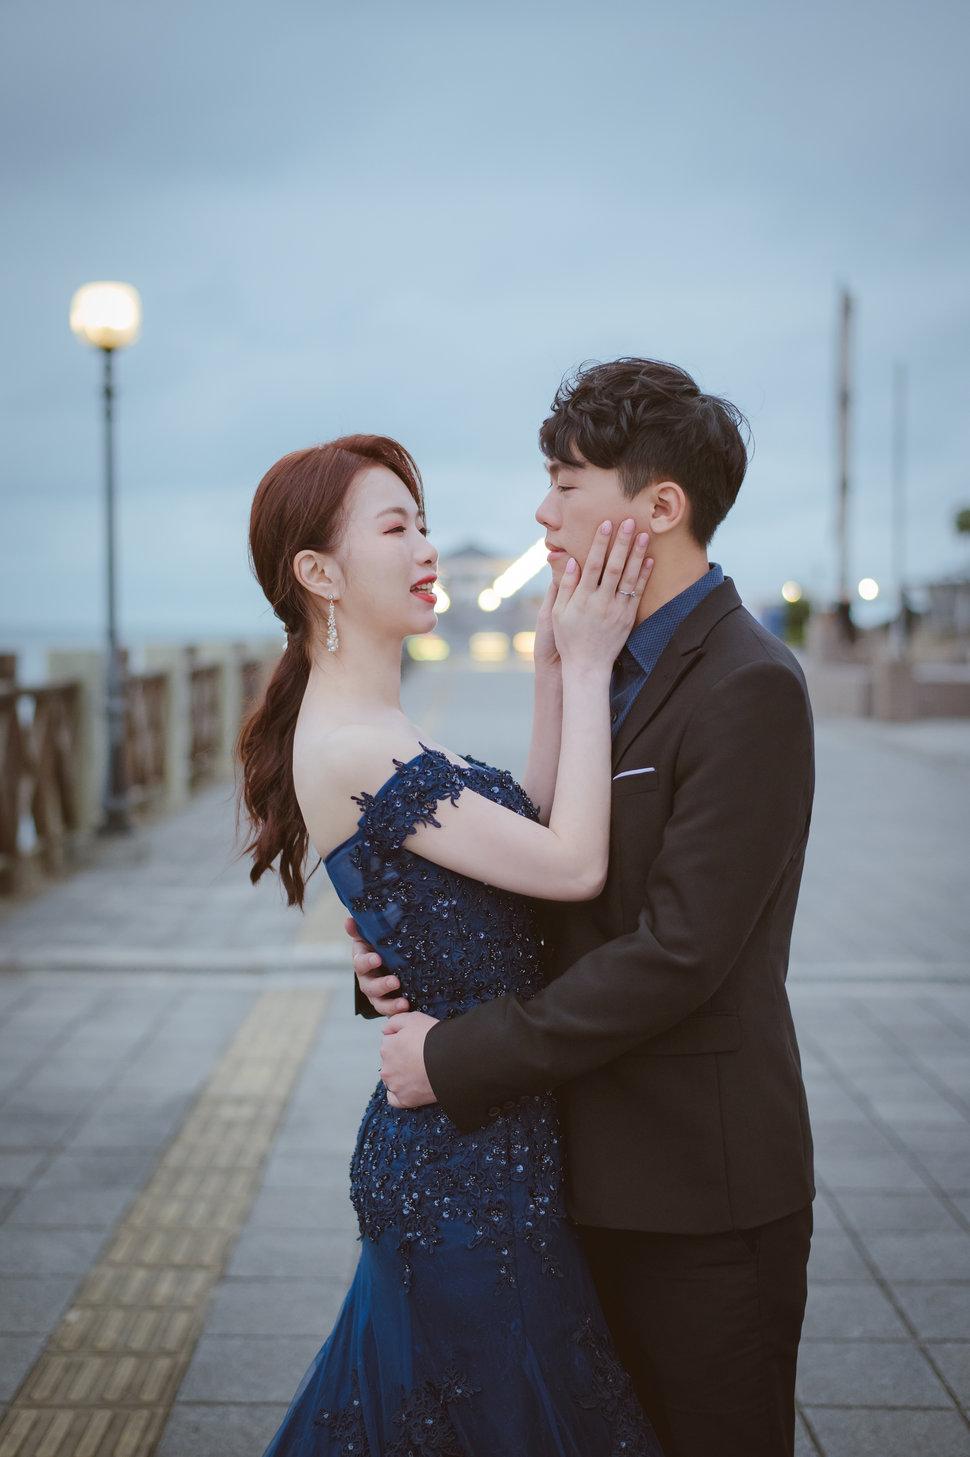 20200111-YEU_5728-1 - 花蓮婚紗 - Sposa Bella《結婚吧》